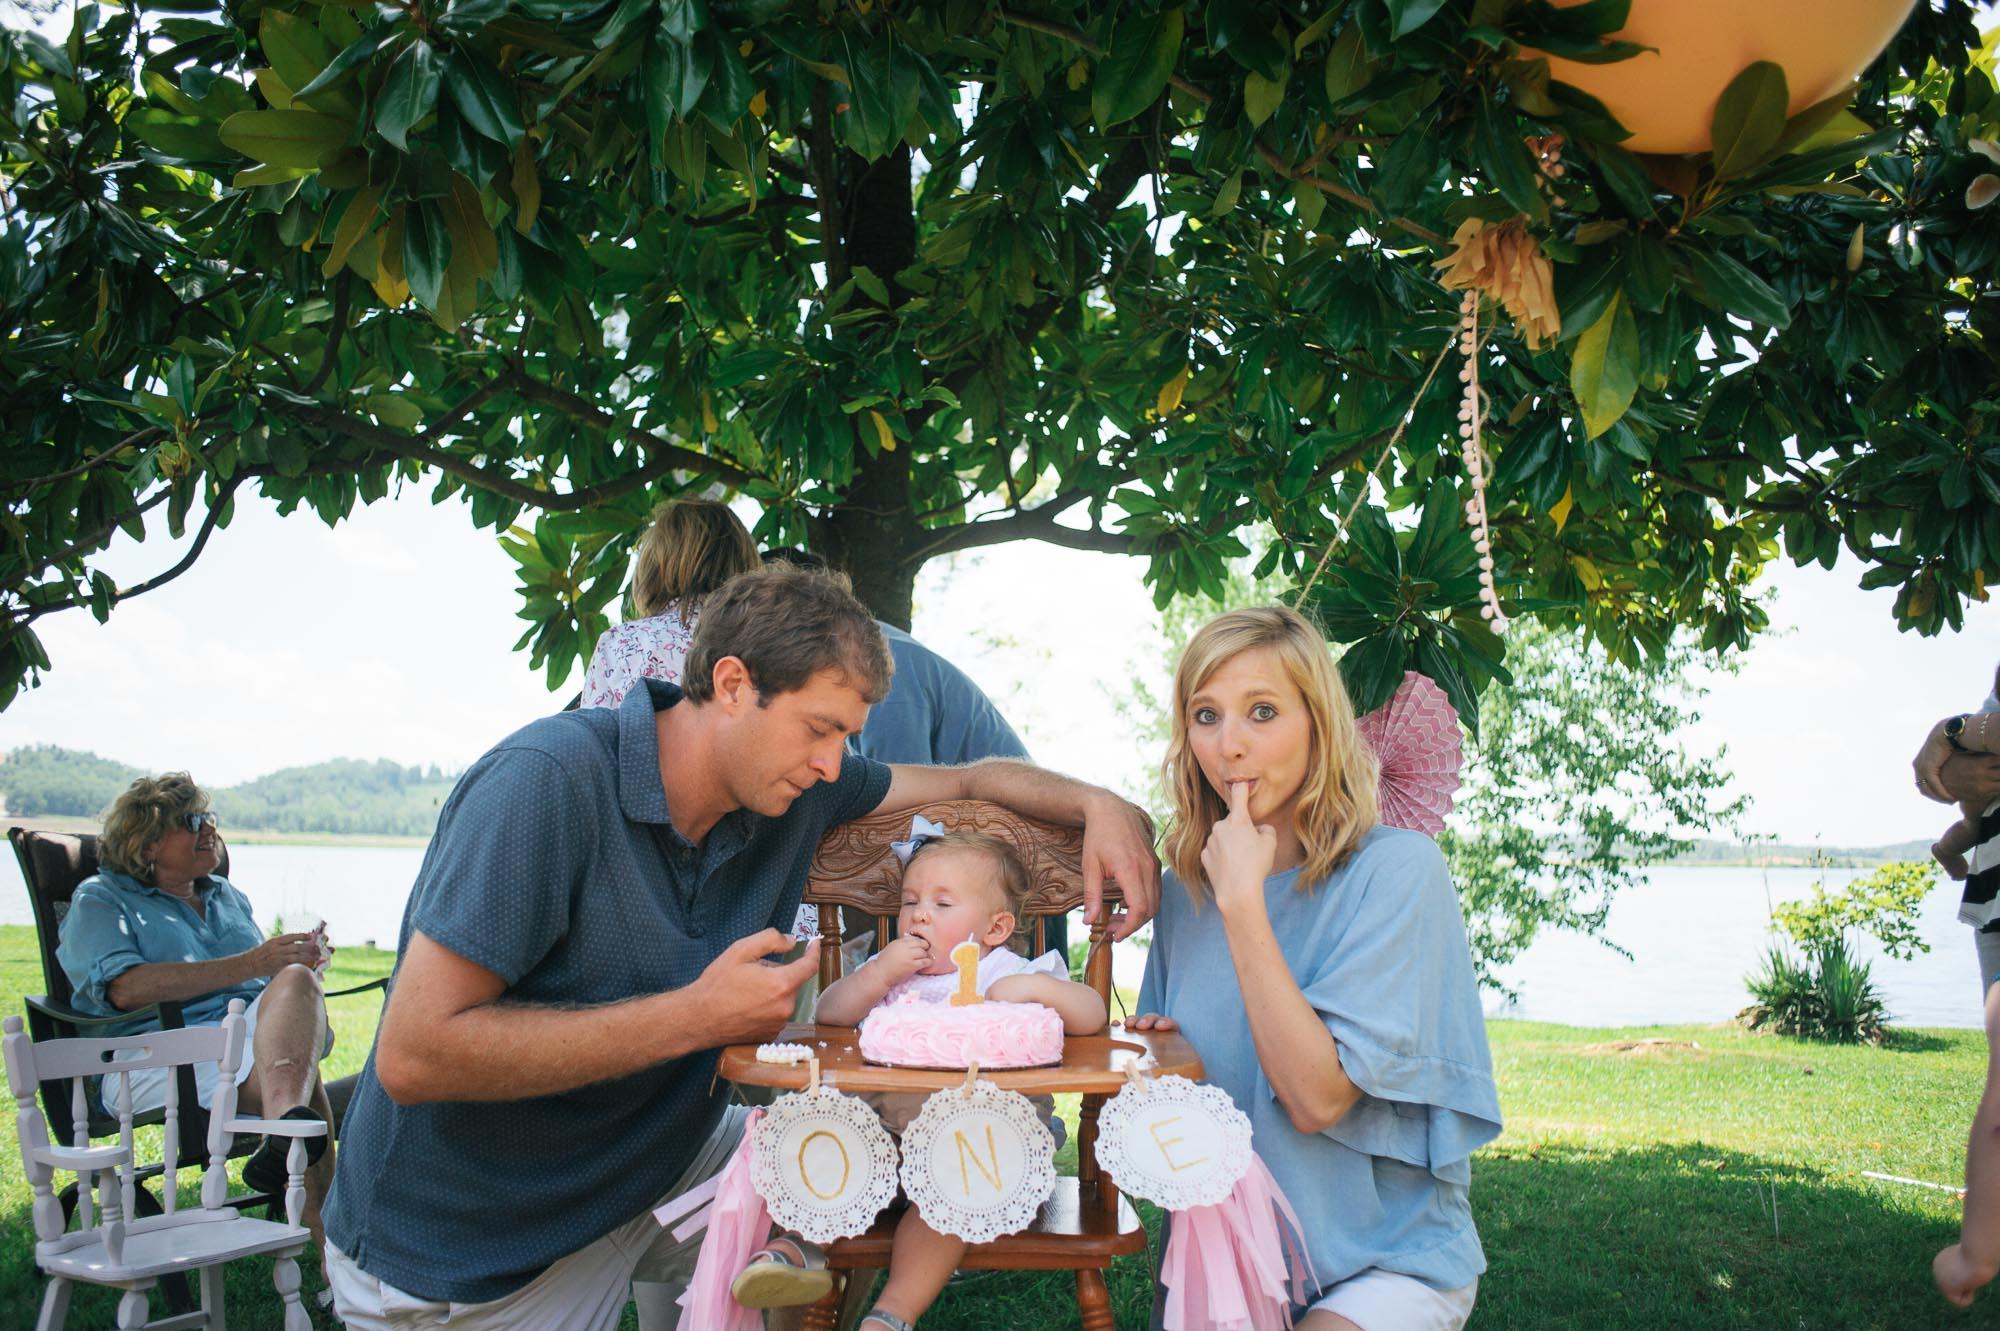 m.newsom-photography-one-year-old-girls-birthday-party-ideas-alice-in-wonderland (38 of 42).jpg